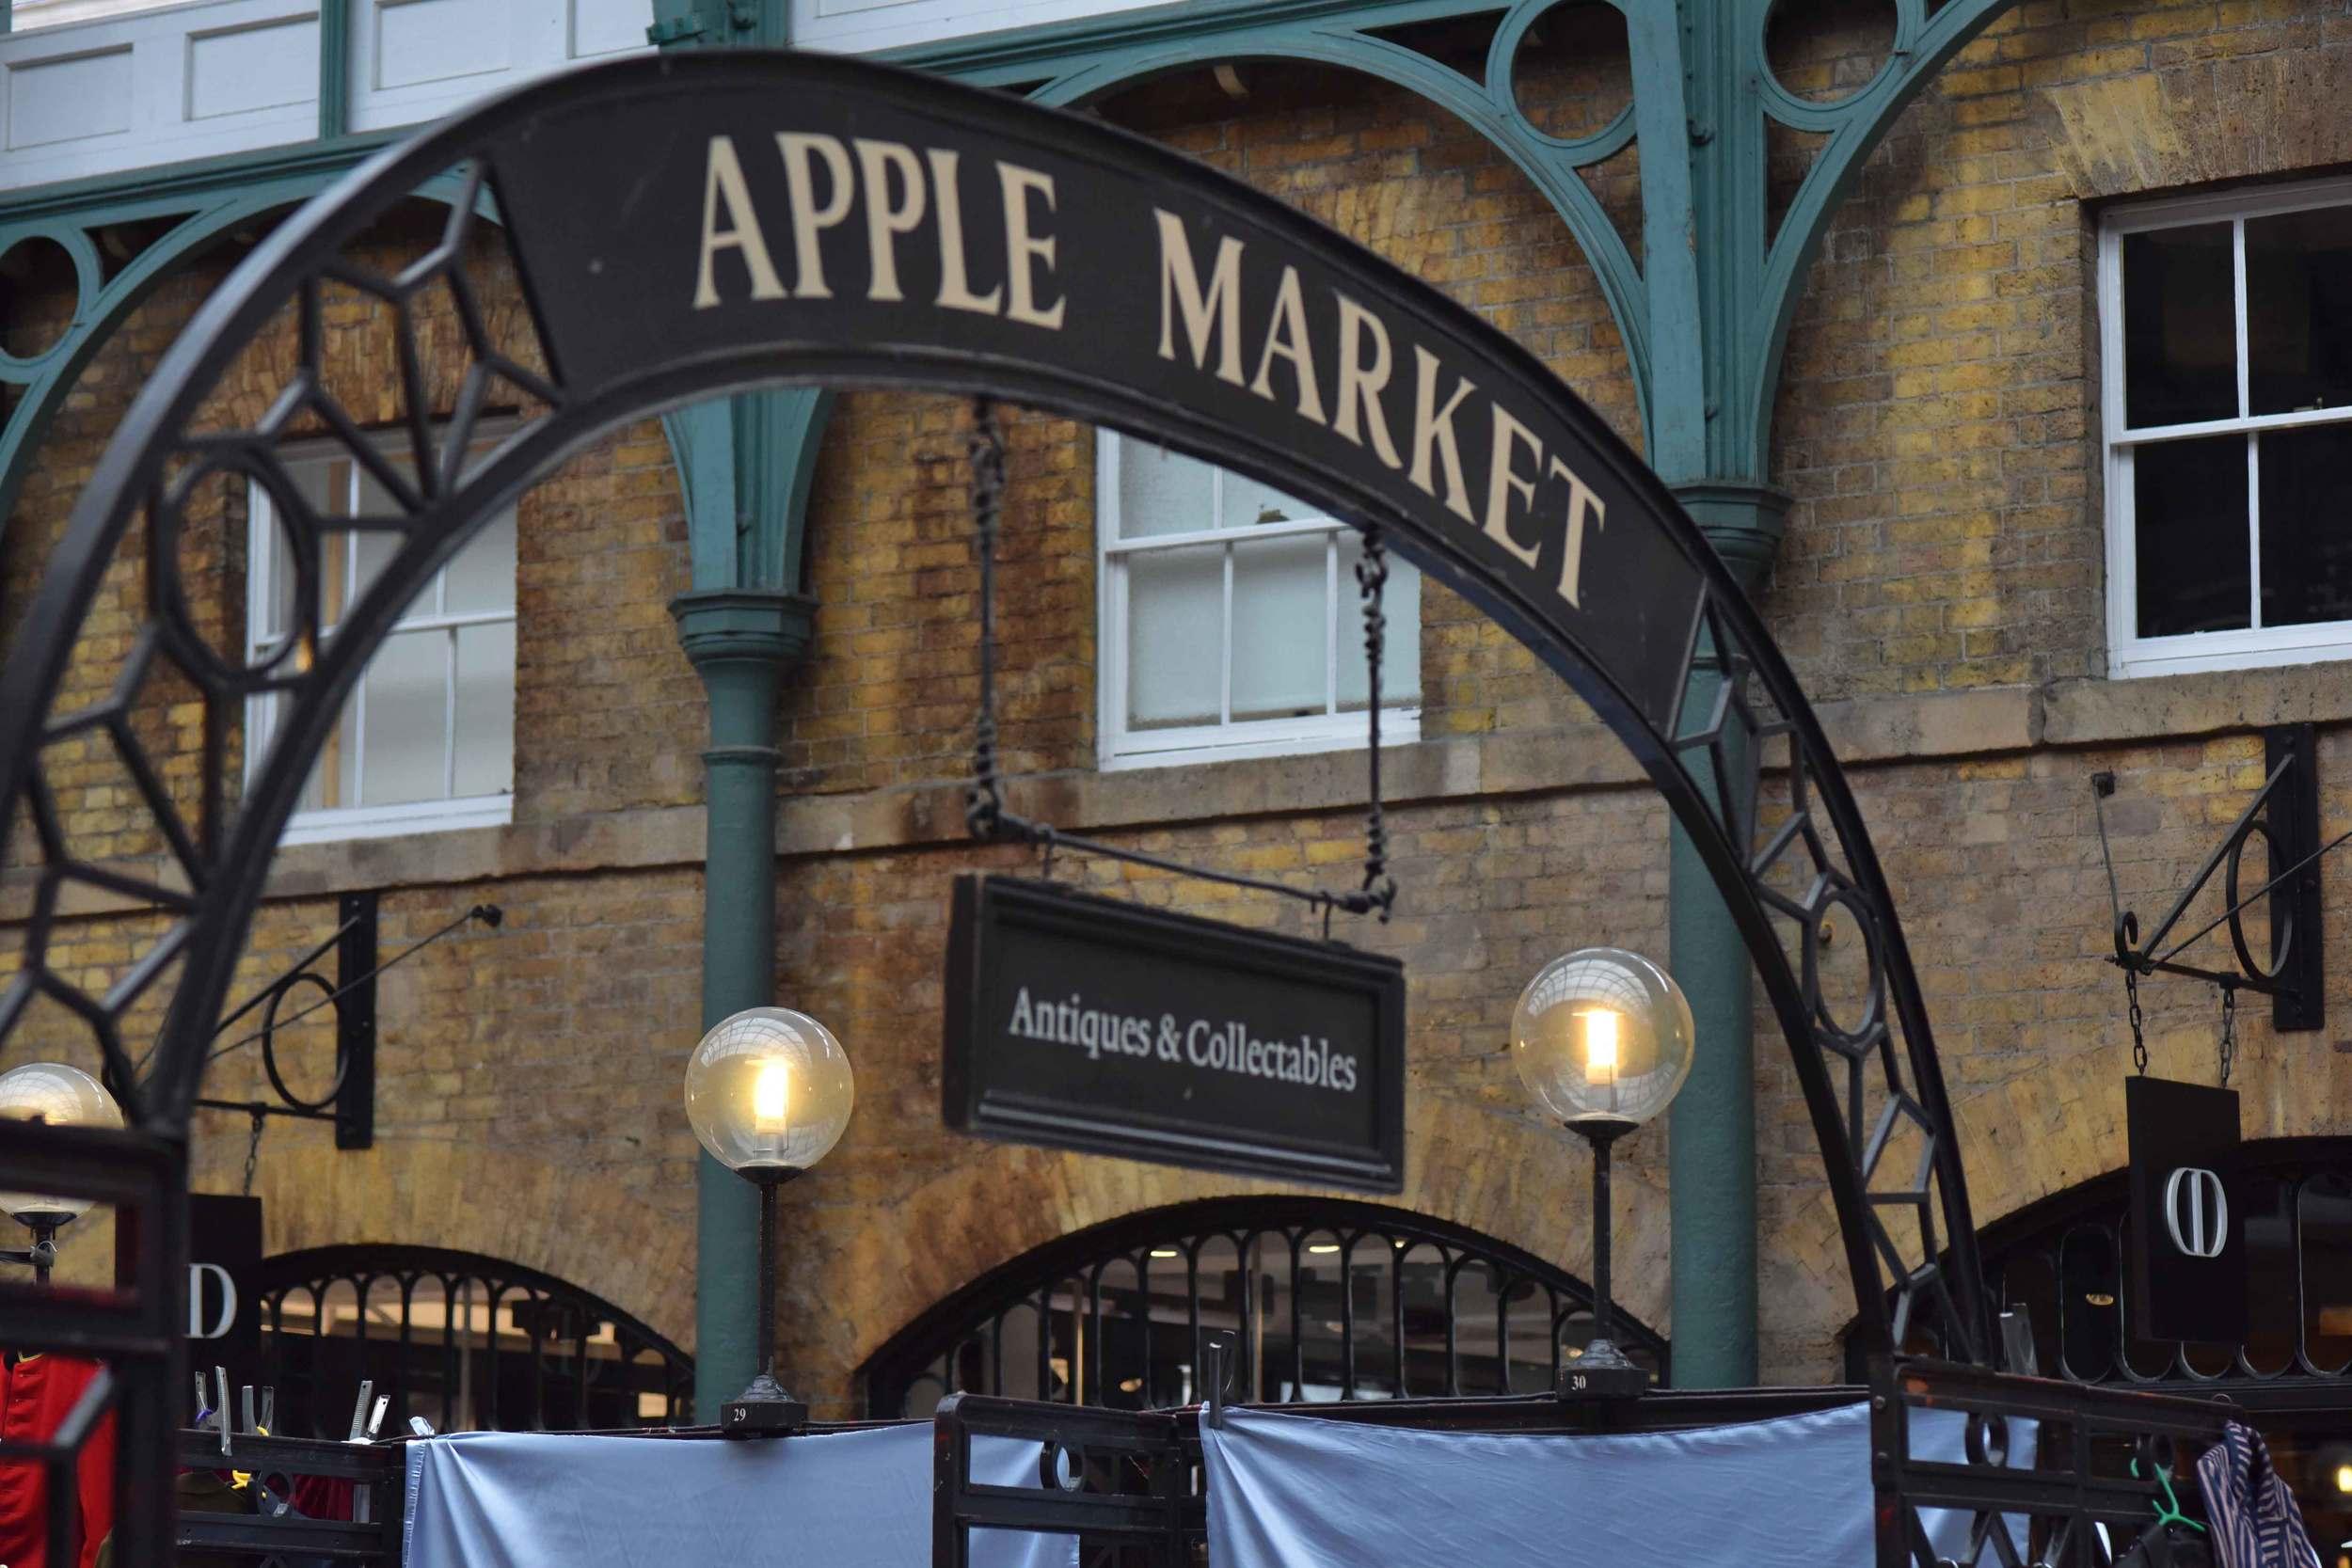 Apple Market, Covent Garden, London, UK. Image©sourcingstyle.com